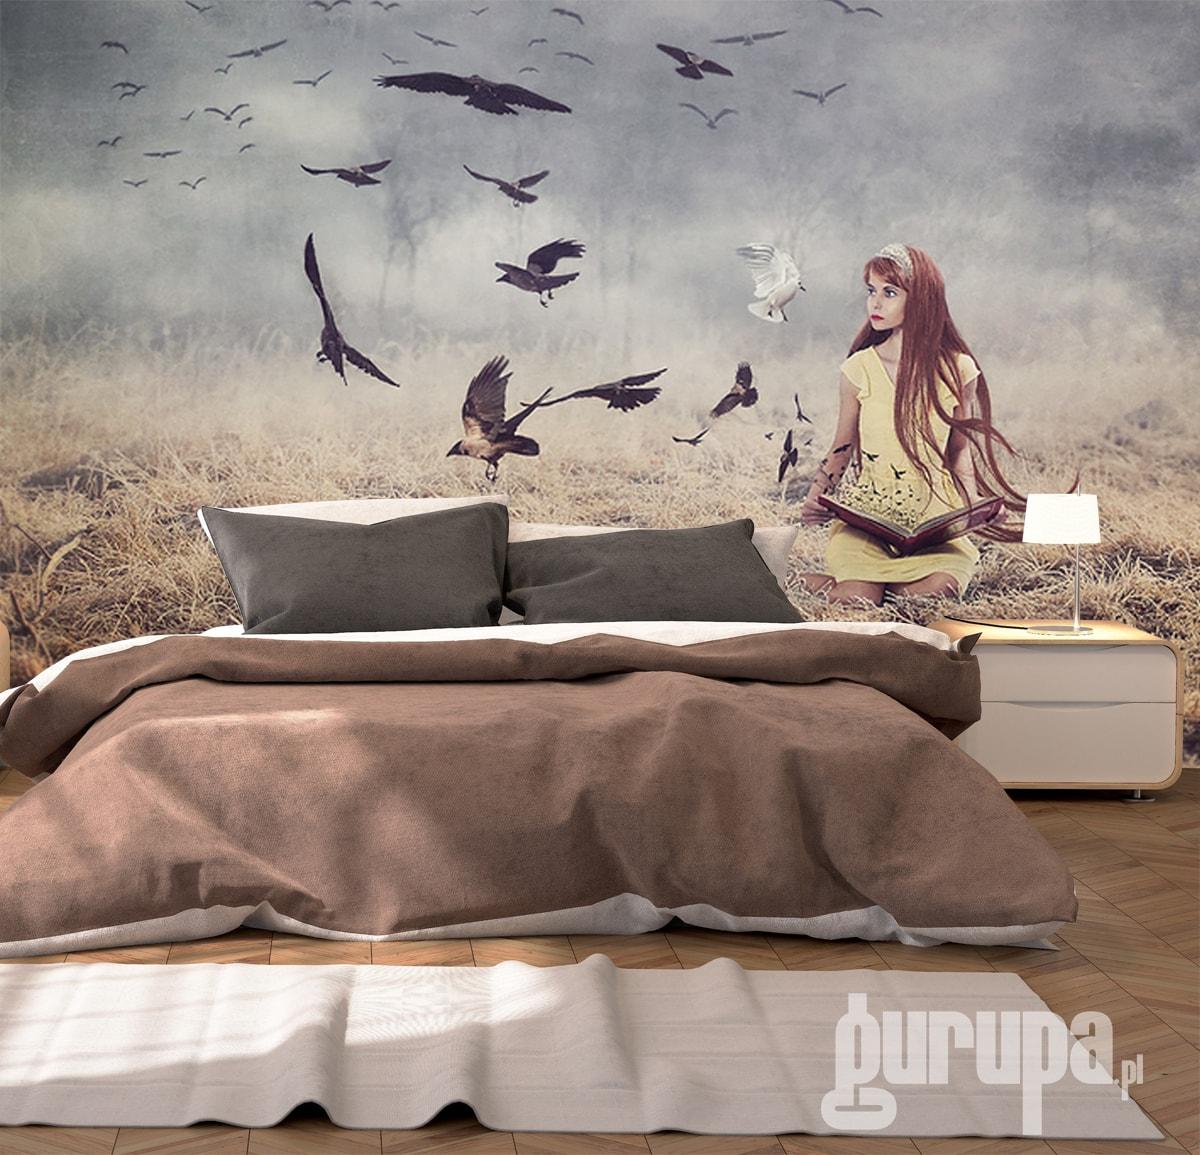 Aleksandra-Biały ptak_arttapeta_ar_w-min